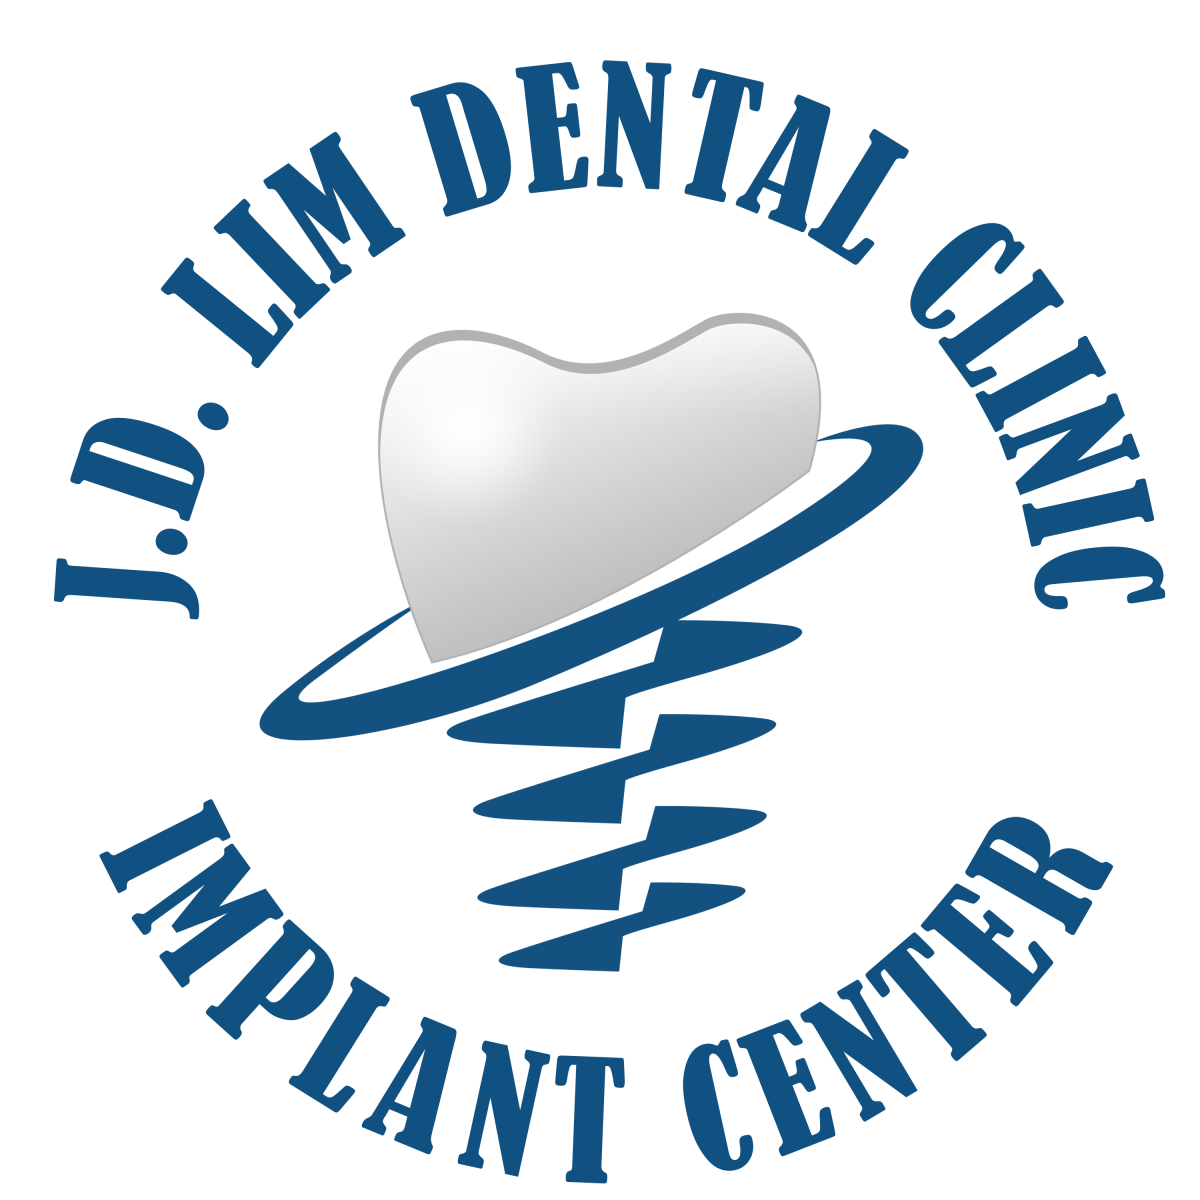 Dentist clipart dental history. J d lim clinic